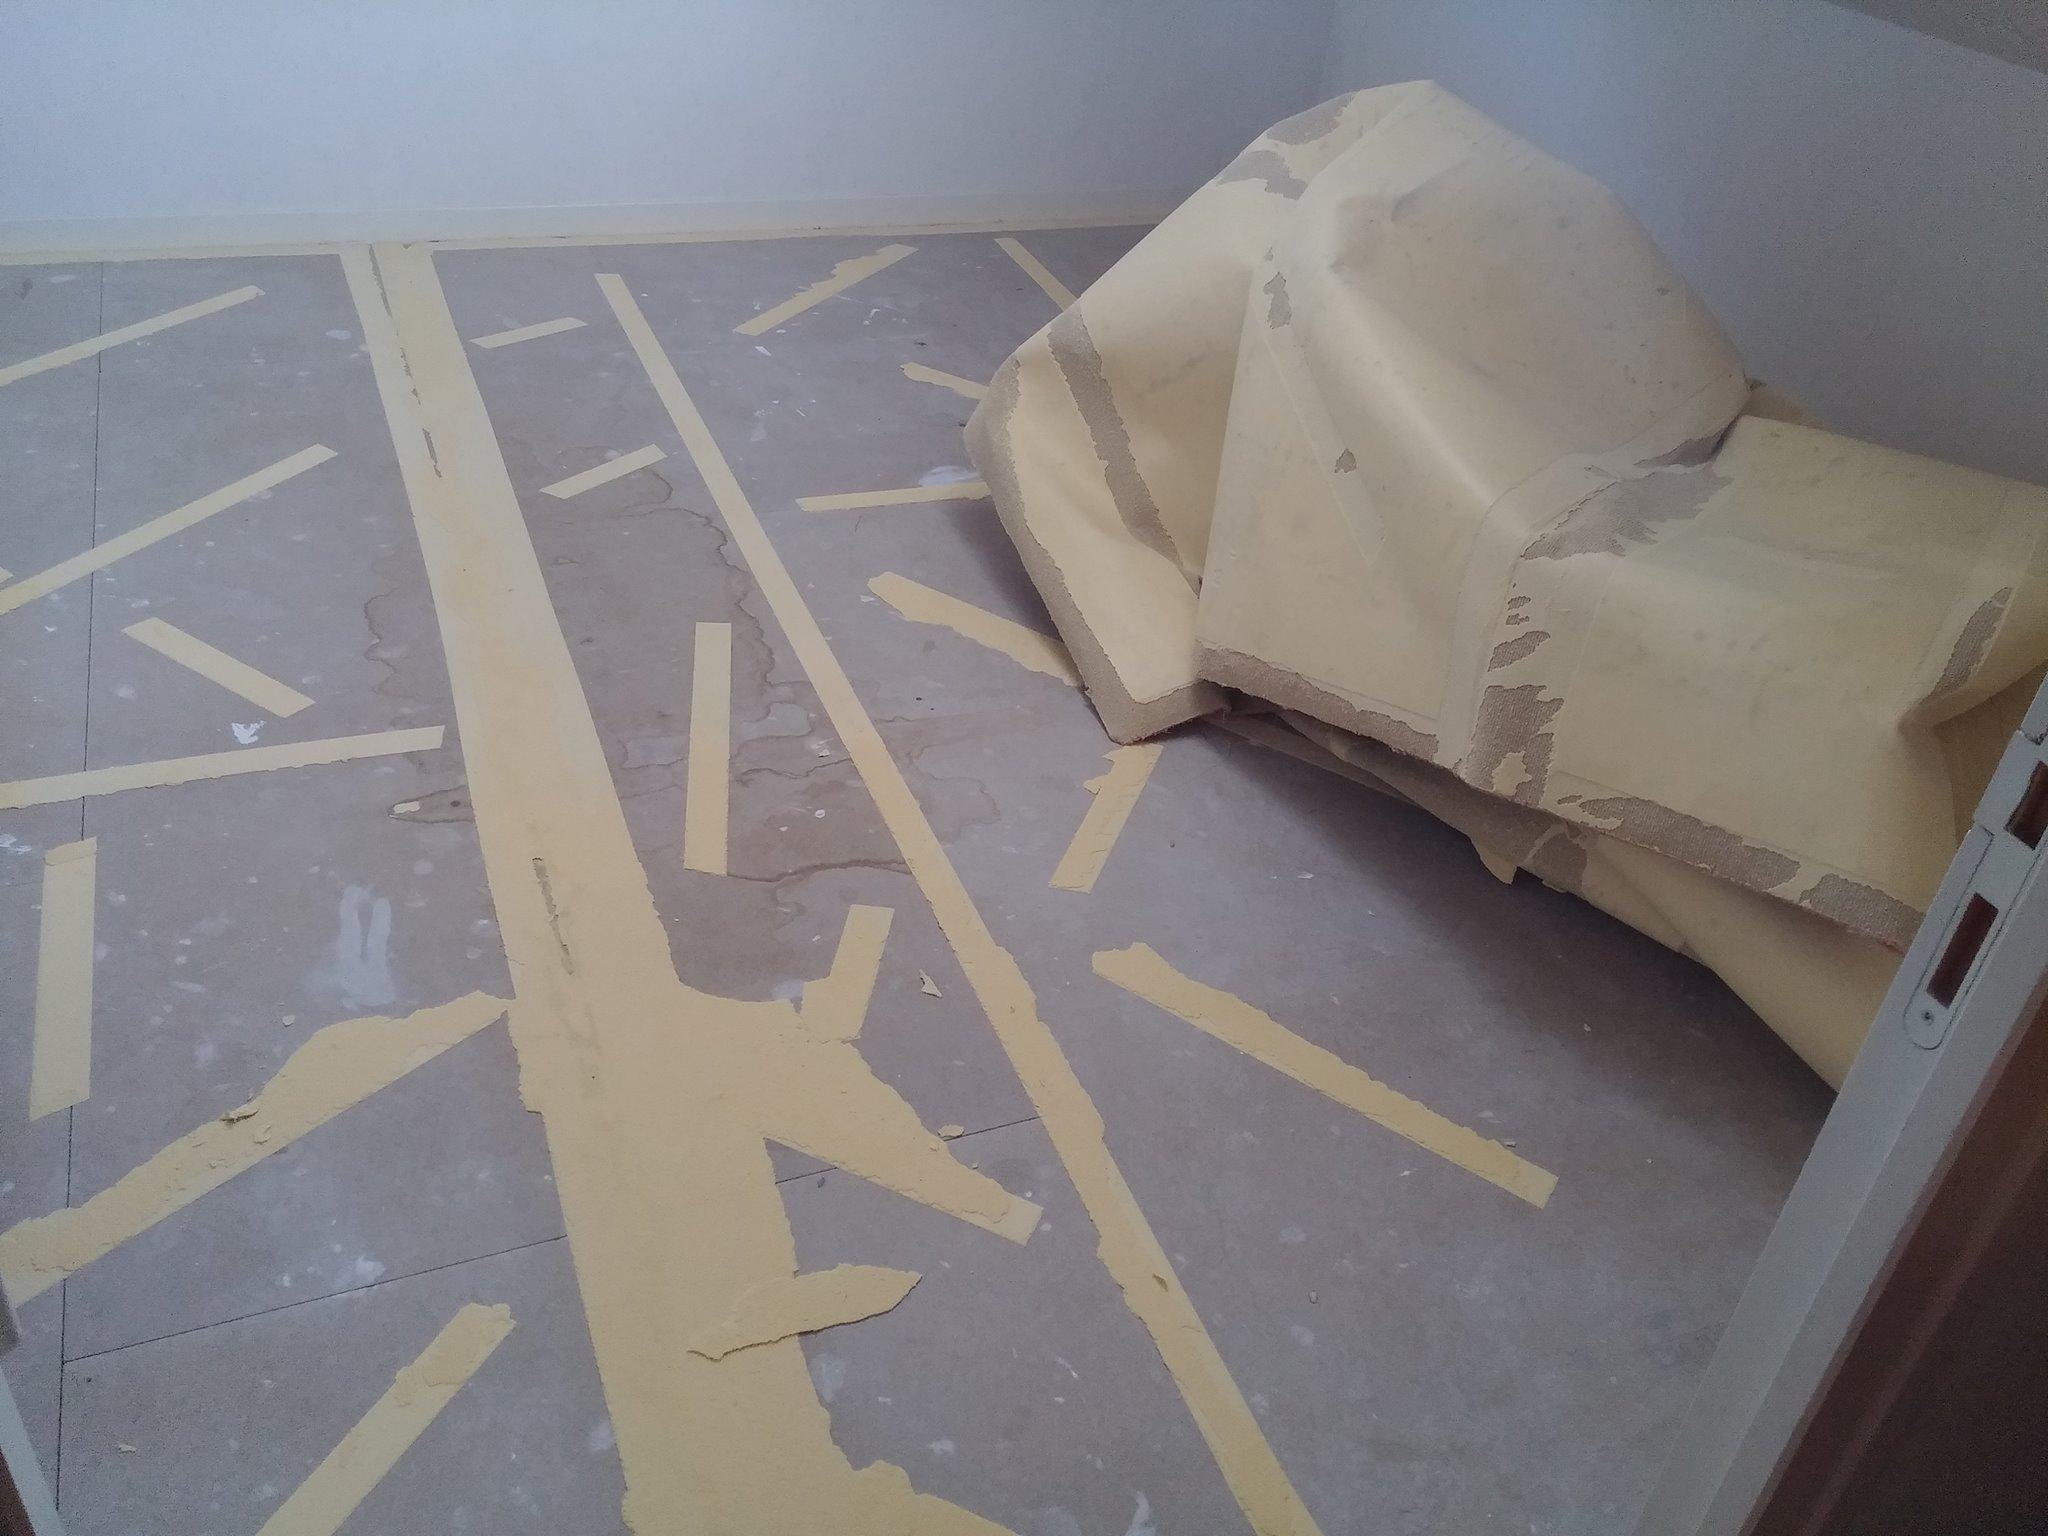 100 sol communaut leroy merlin. Black Bedroom Furniture Sets. Home Design Ideas